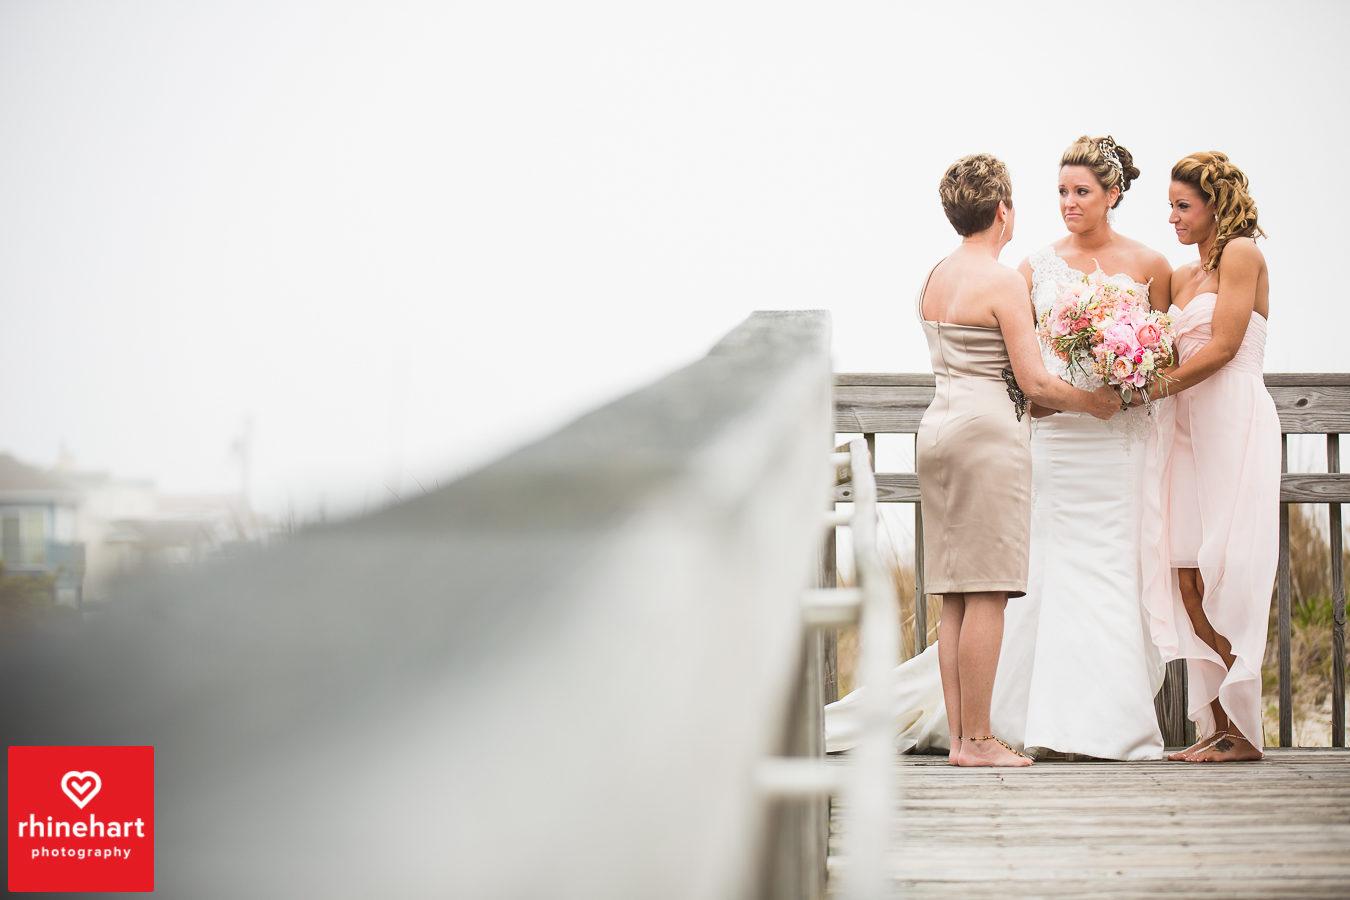 reeds-stone-harbor-wedding-photographer-114